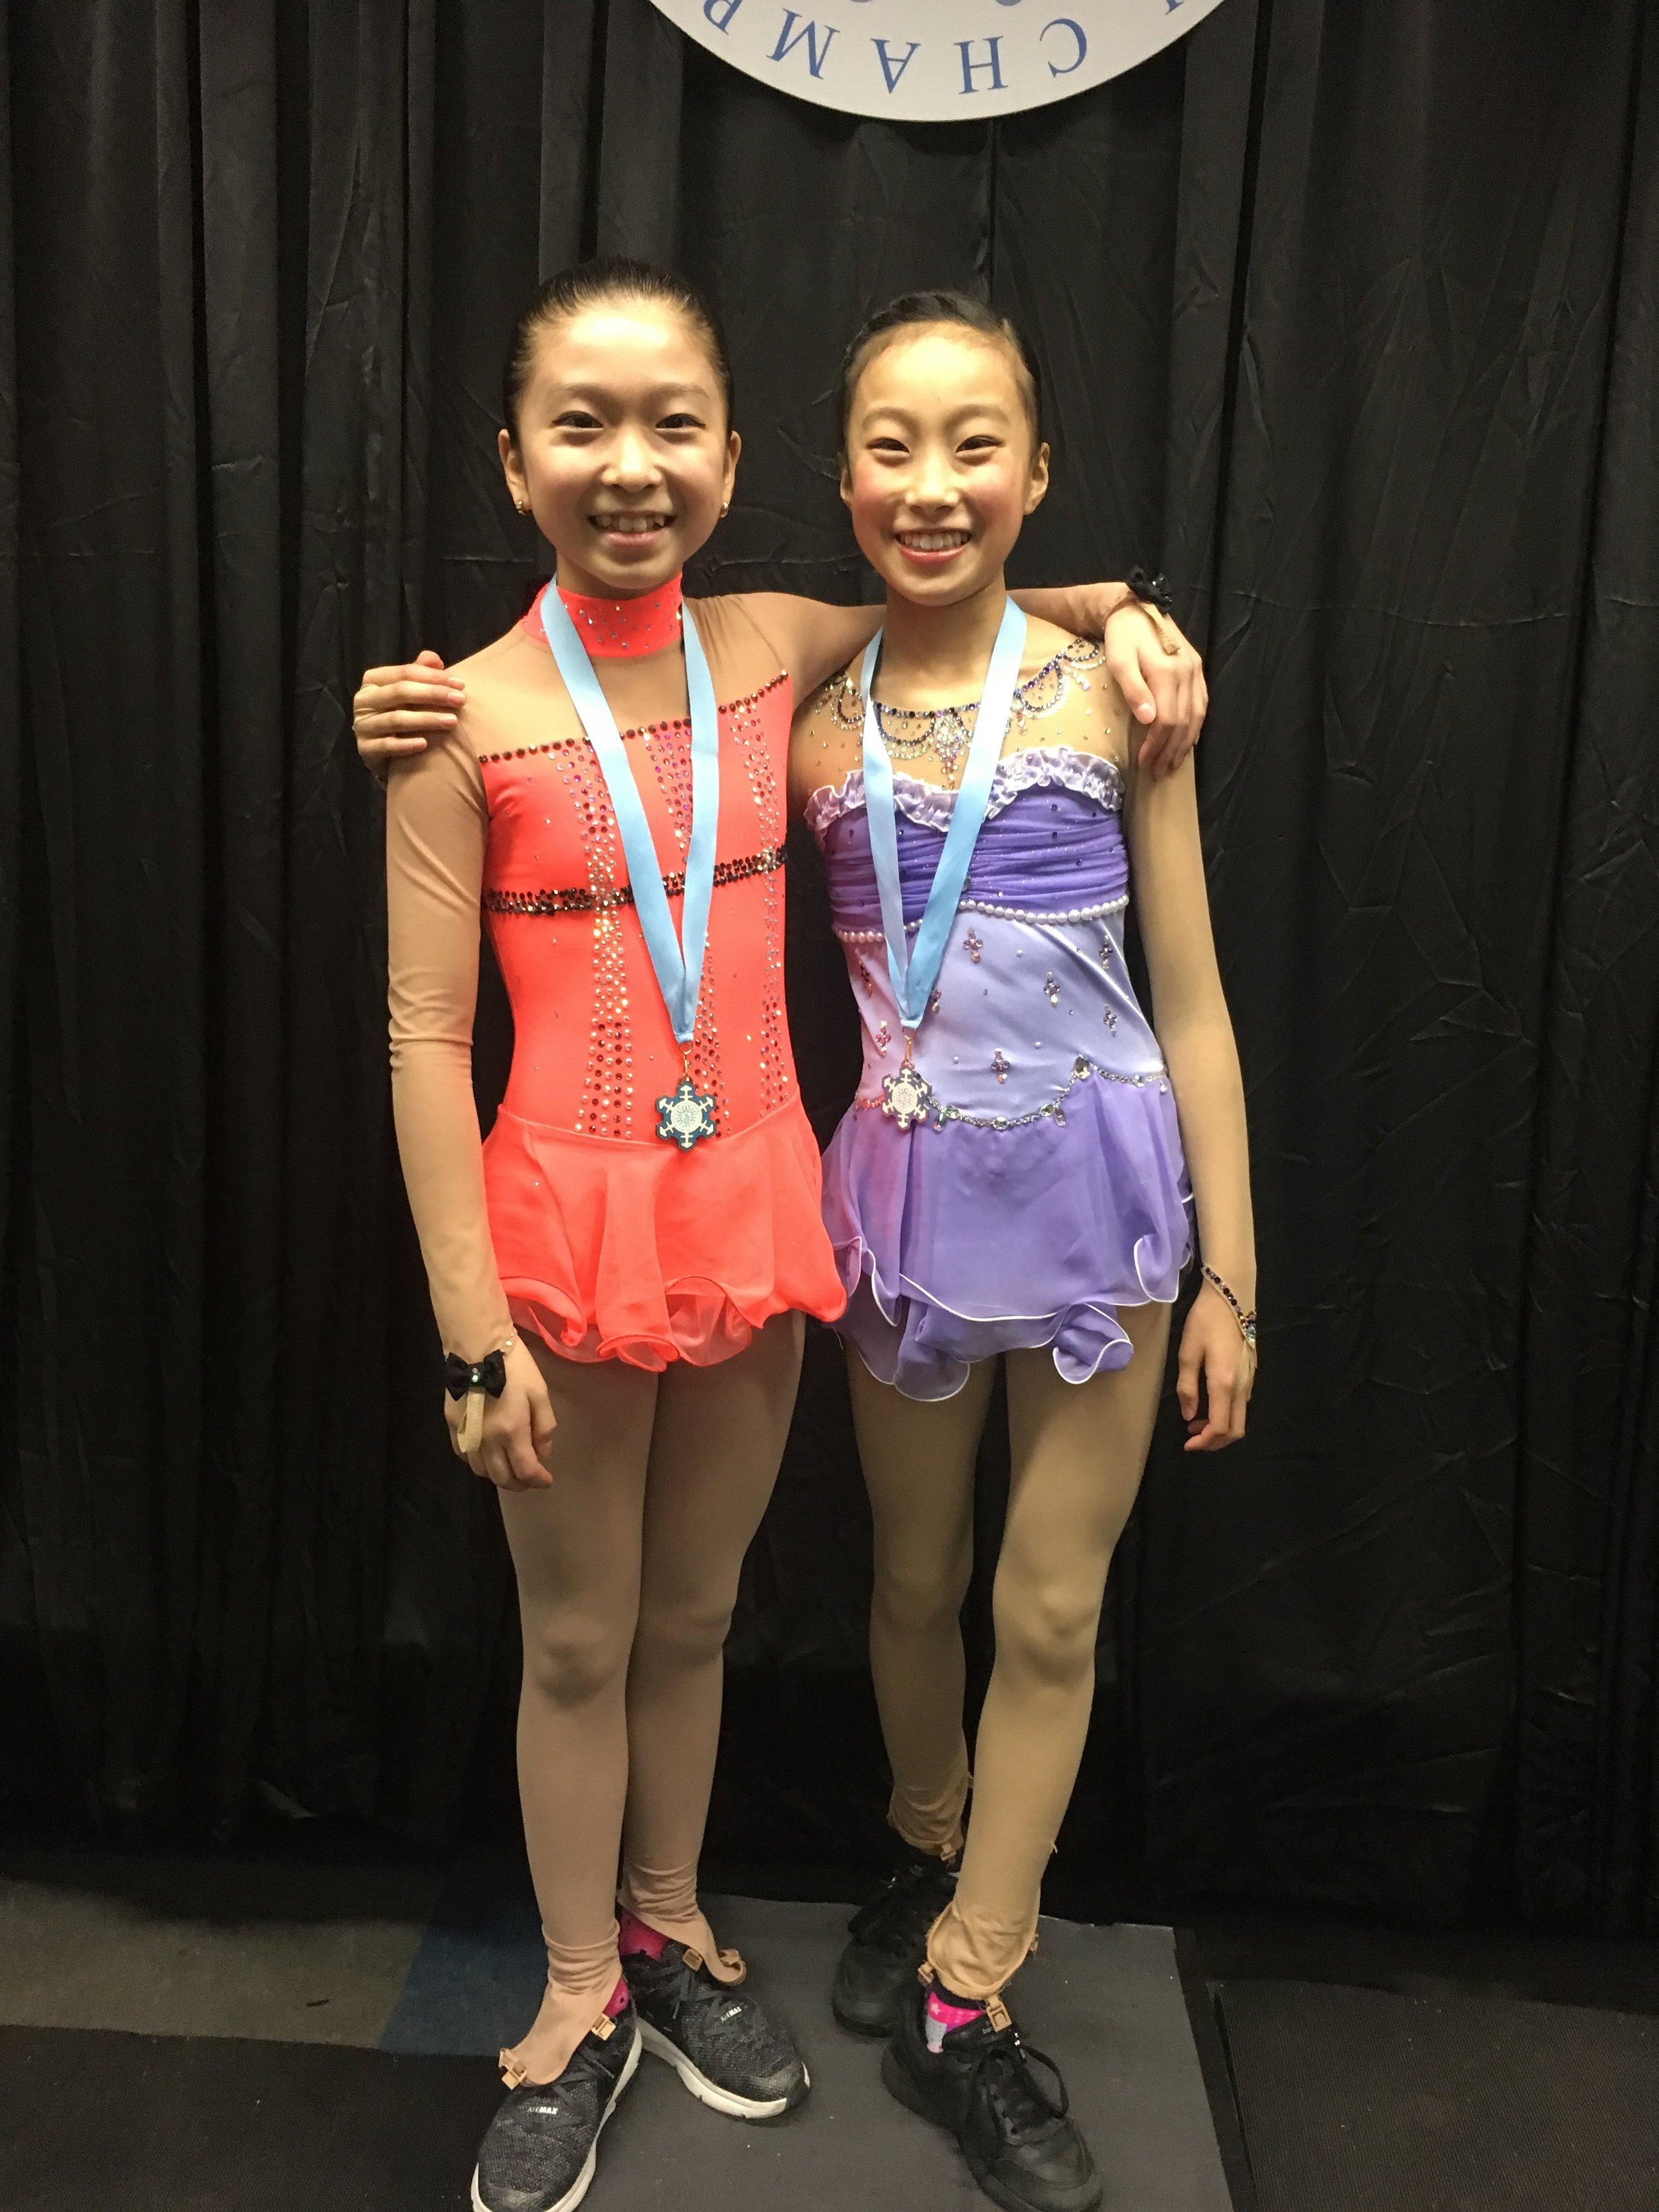 Luka & Yena after their short program performances (Luka 2nd, Yena 3rd)